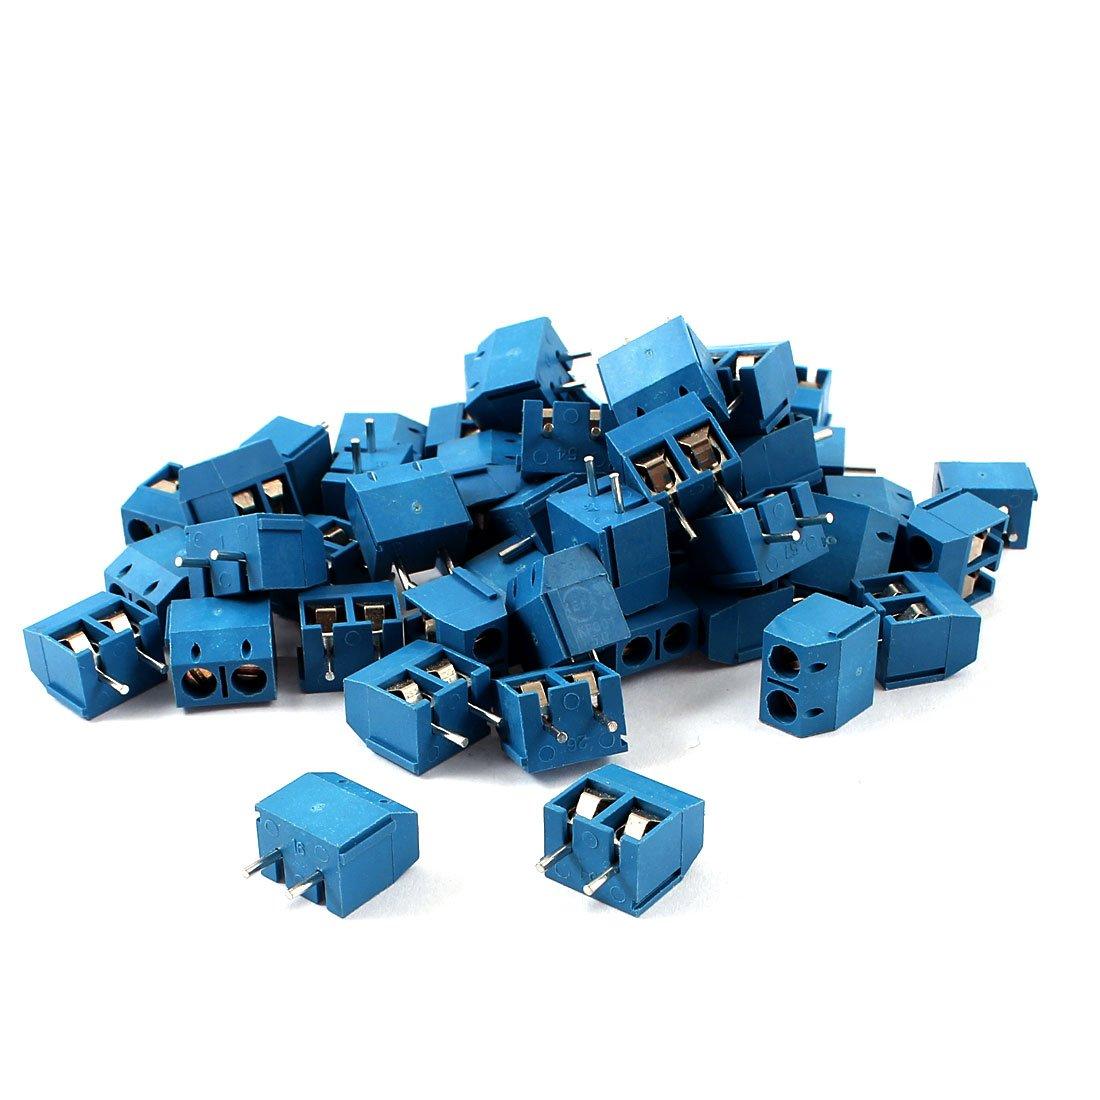 uxcell 50pcs 5mm Spacing PCB Mount Screw Terminal Blocks Blue 300V 16A